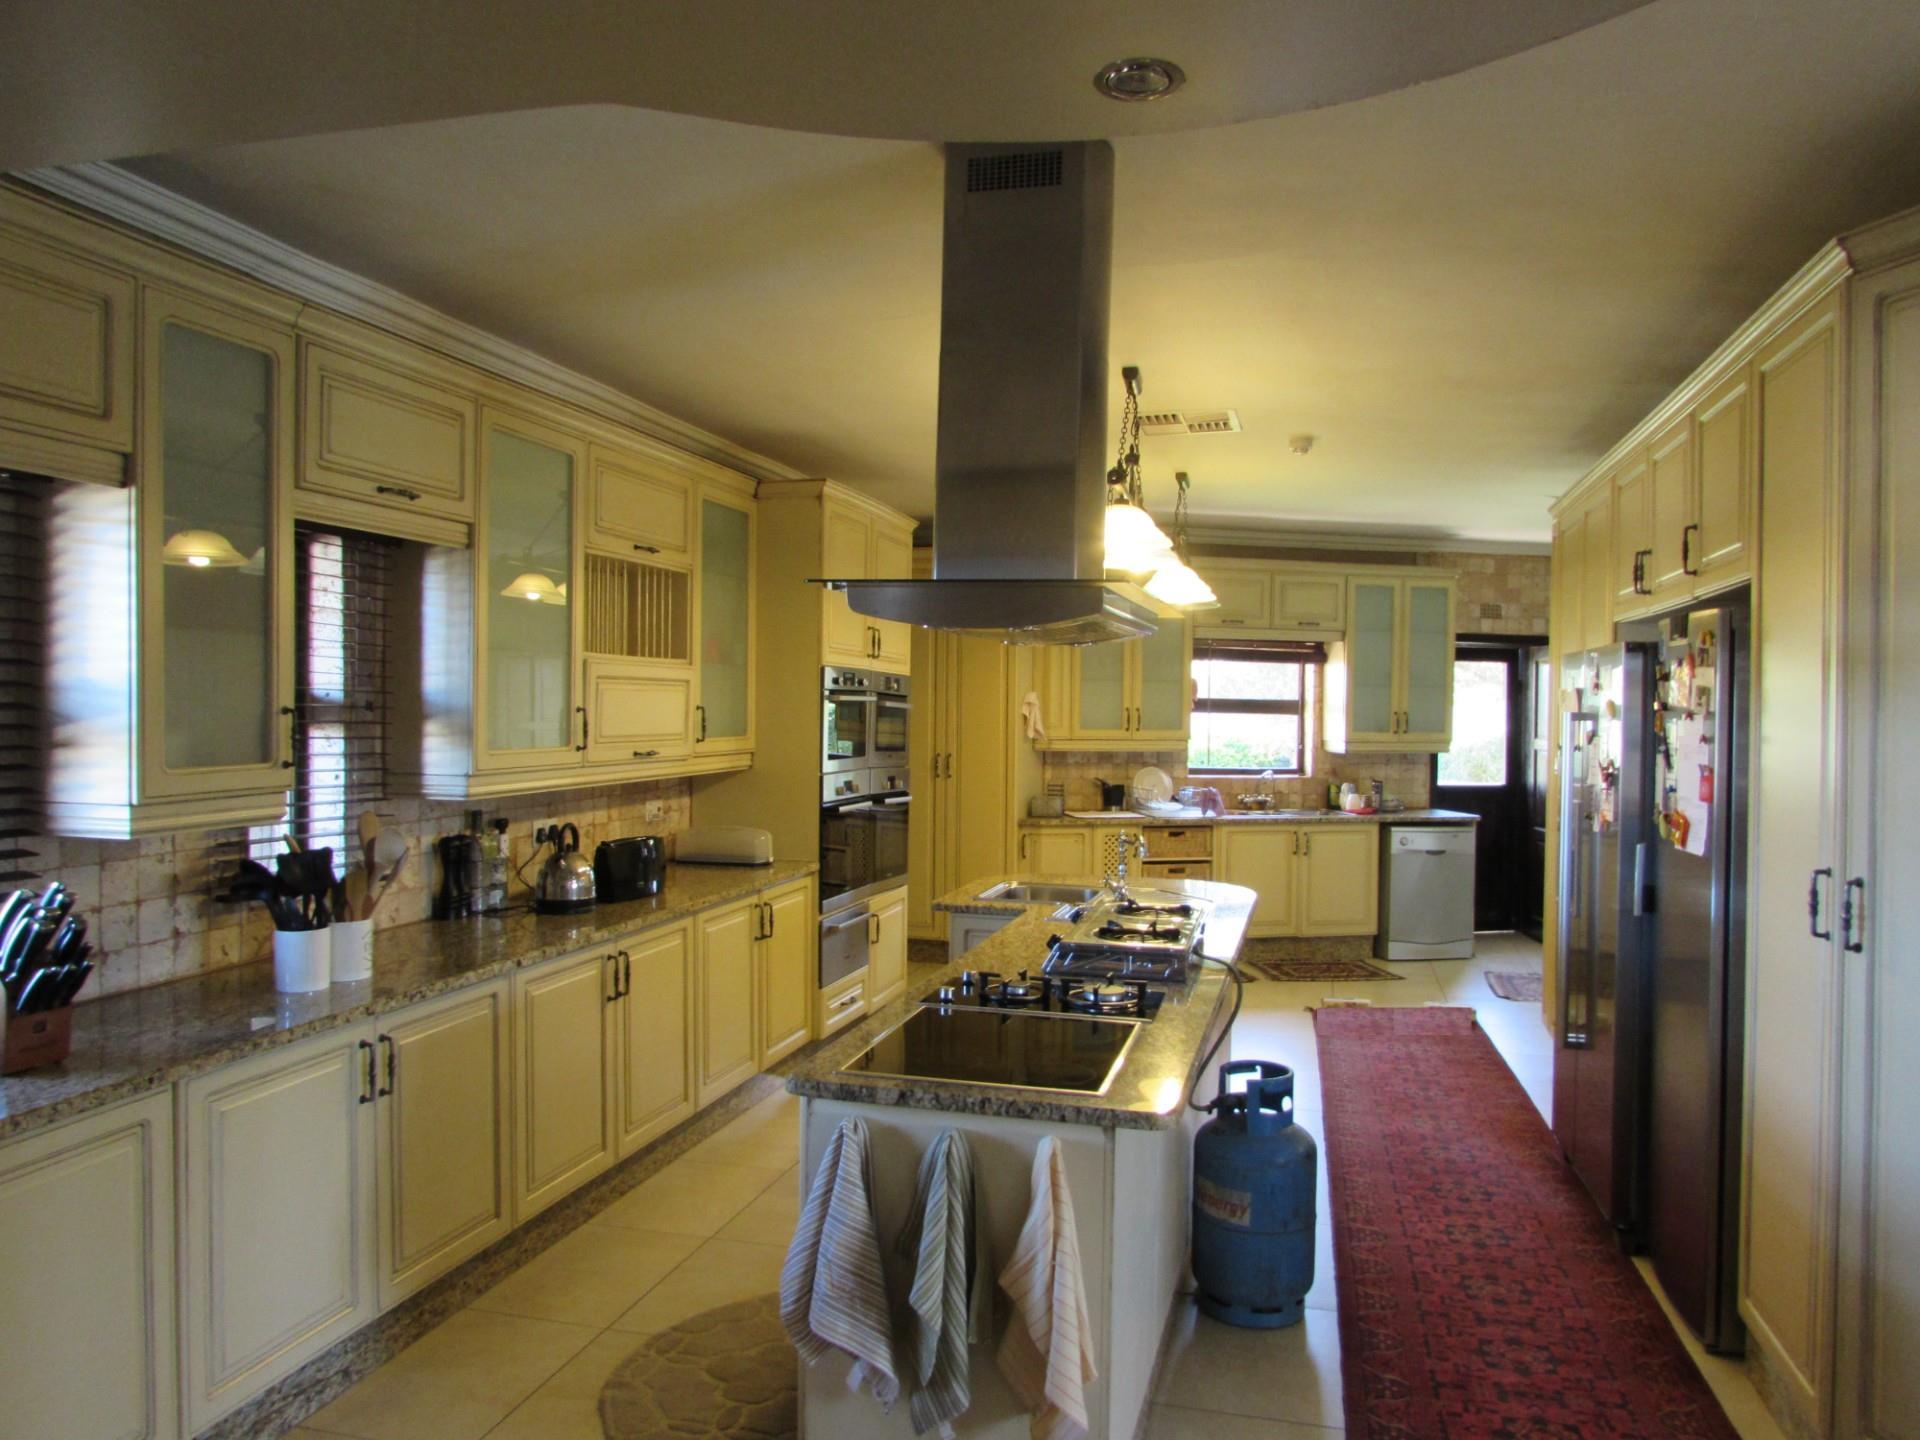 8 Bedroom House For Sale in Mokolodi 1